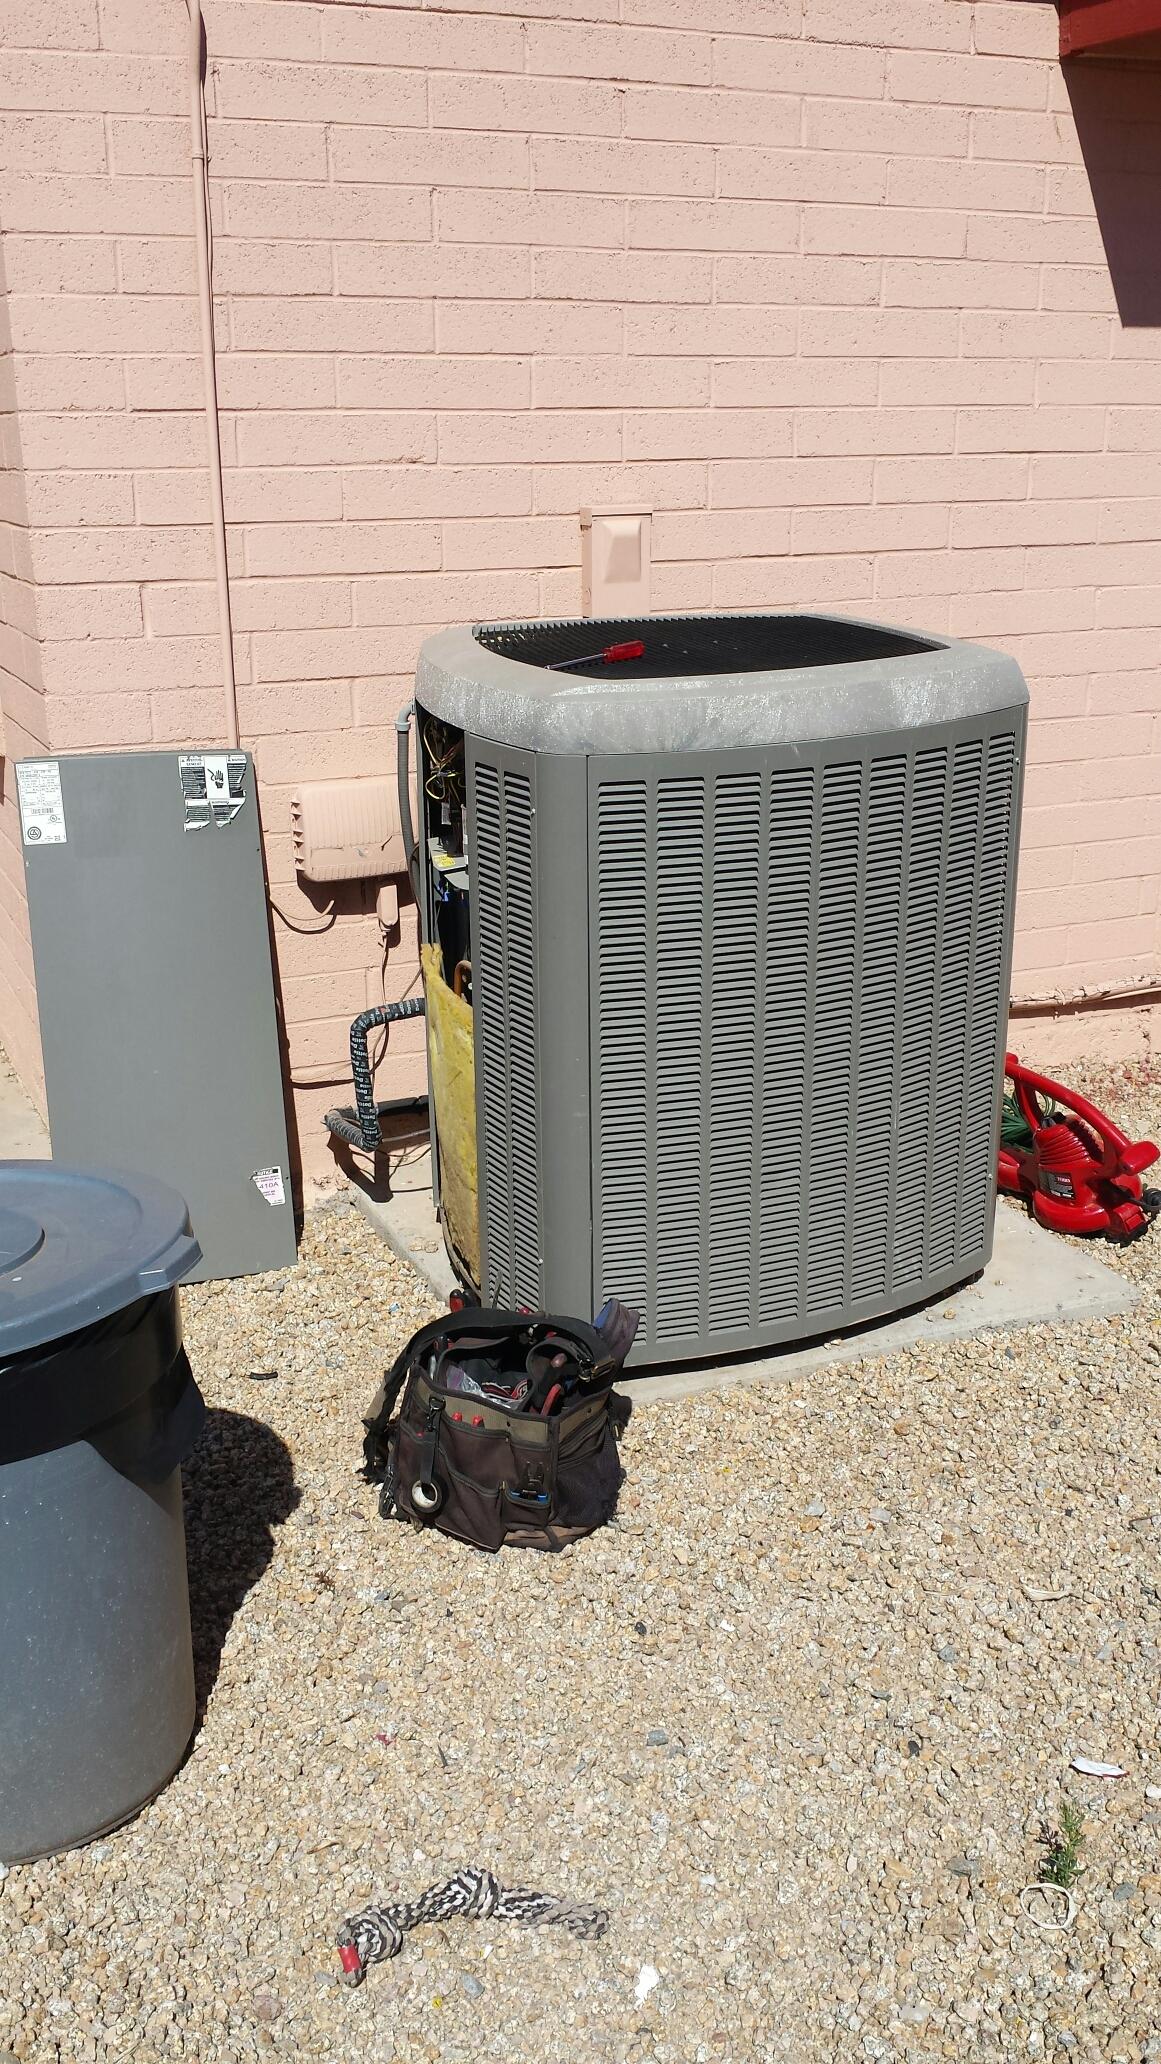 Phoenix, AZ - Spring Maintenance on this Lennox Air Conditioner. You'll Lika...Hobaica!